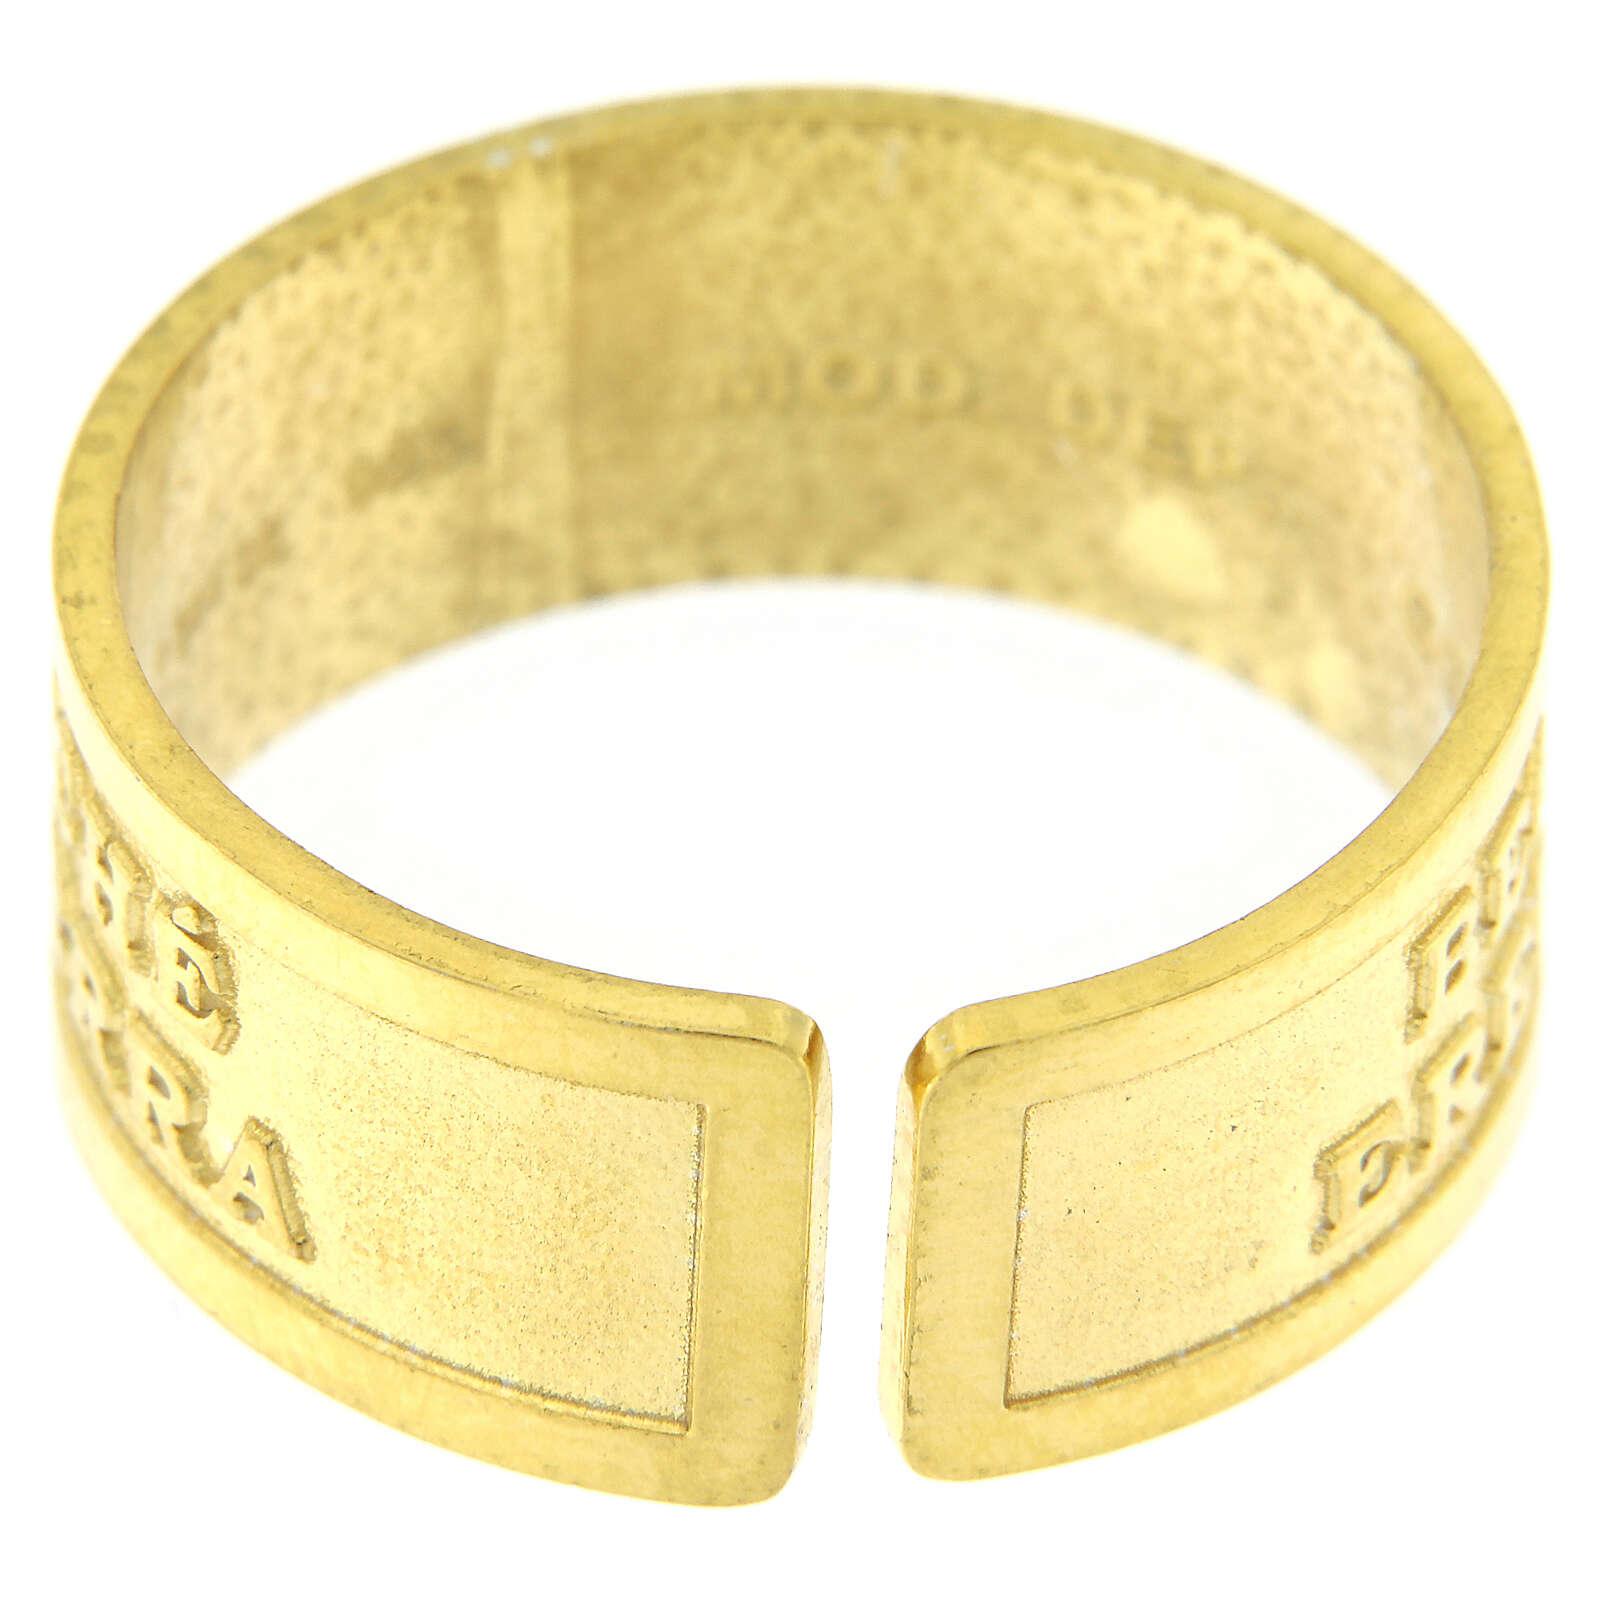 Anillo ajustable Beati i Miti plata 925 dorada 3